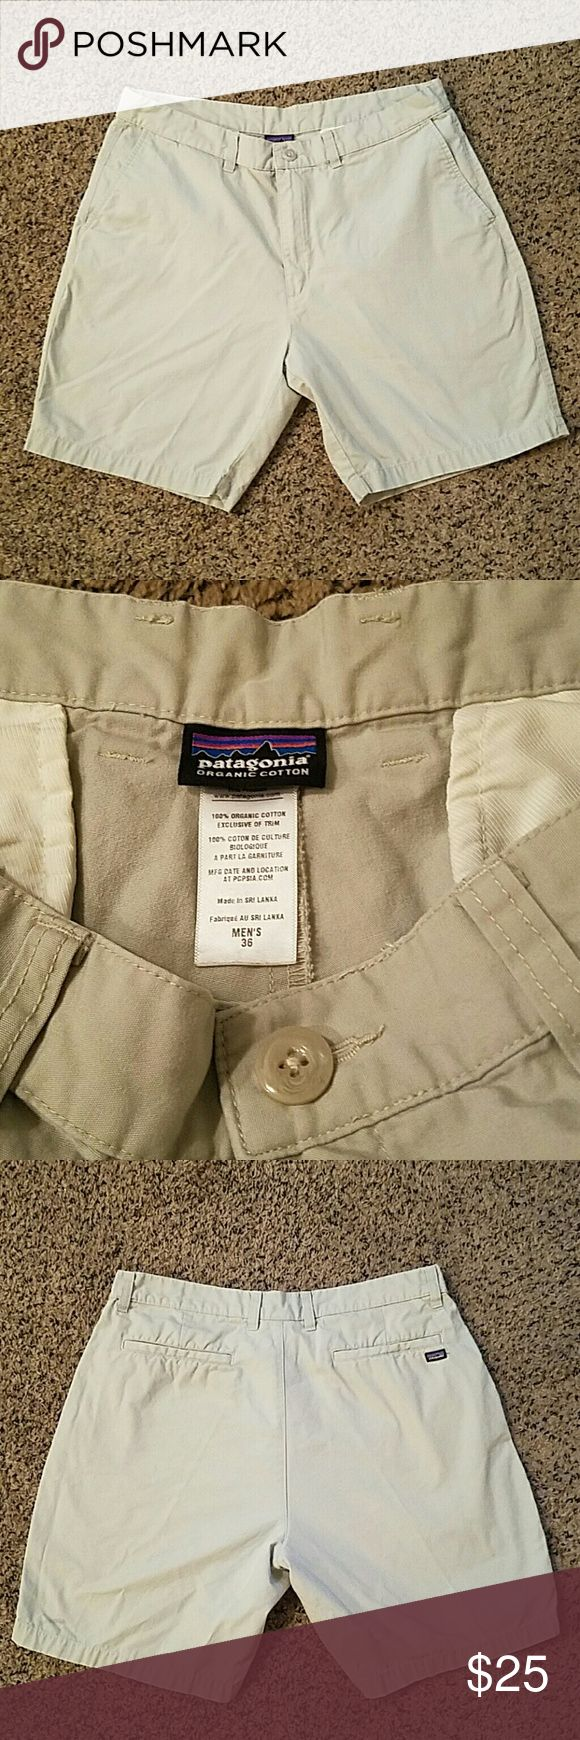 "Selling this Men's Patagonia All Wear 8"" shorts on Poshmark! My username is: jkcontrol. #shopmycloset #poshmark #fashion #shopping #style #forsale #Patagonia #Other"